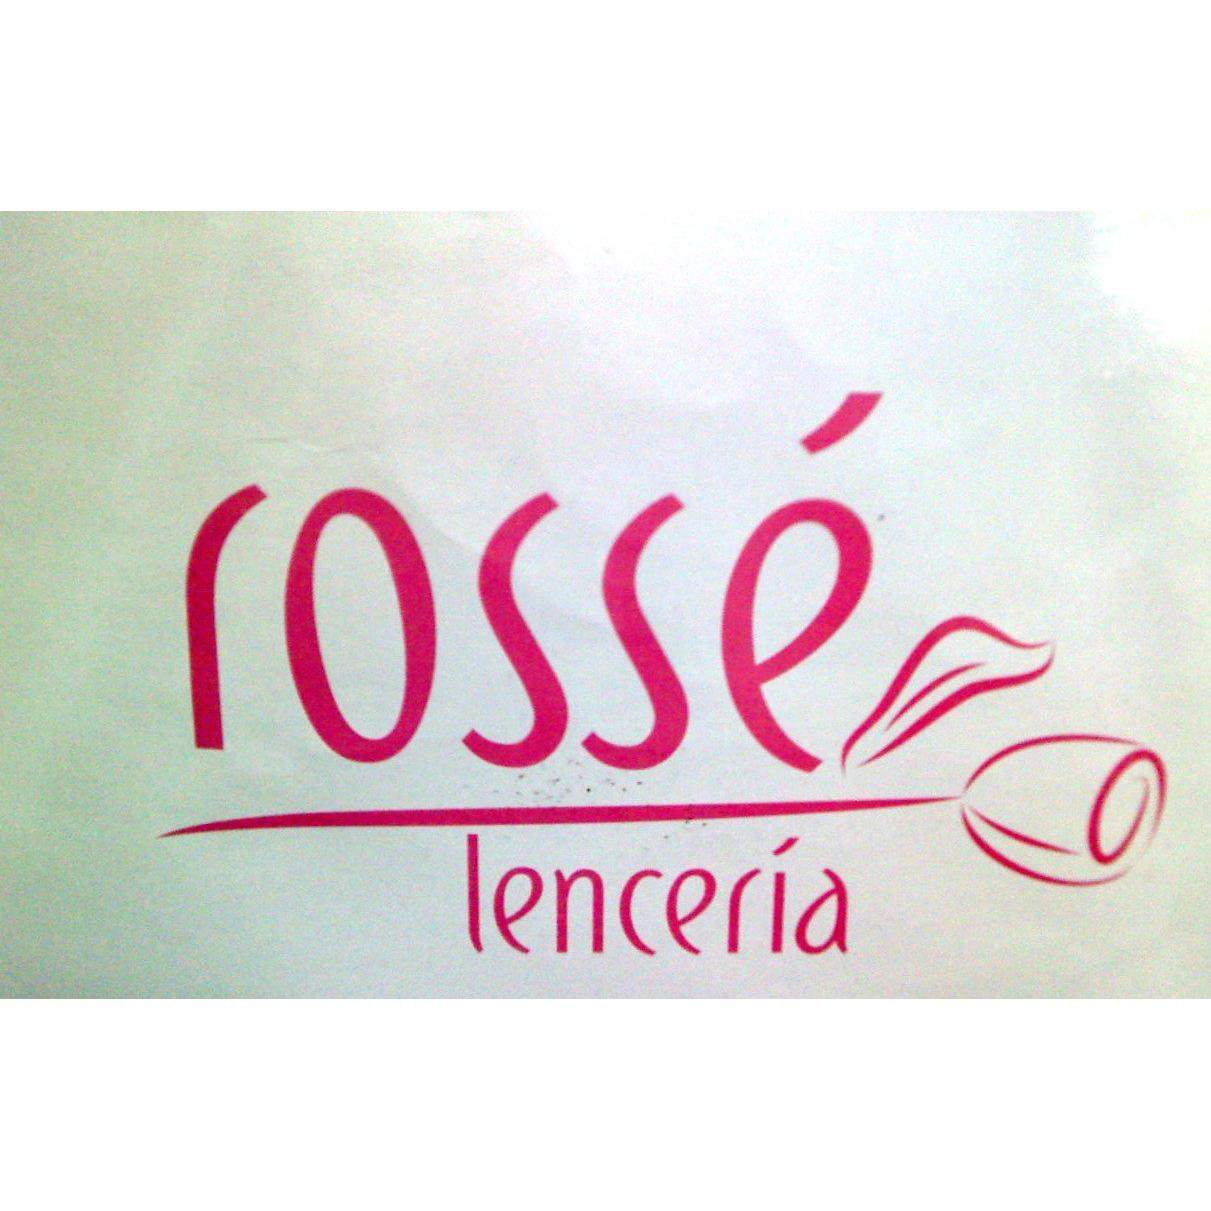 ROSSE LENCERIA